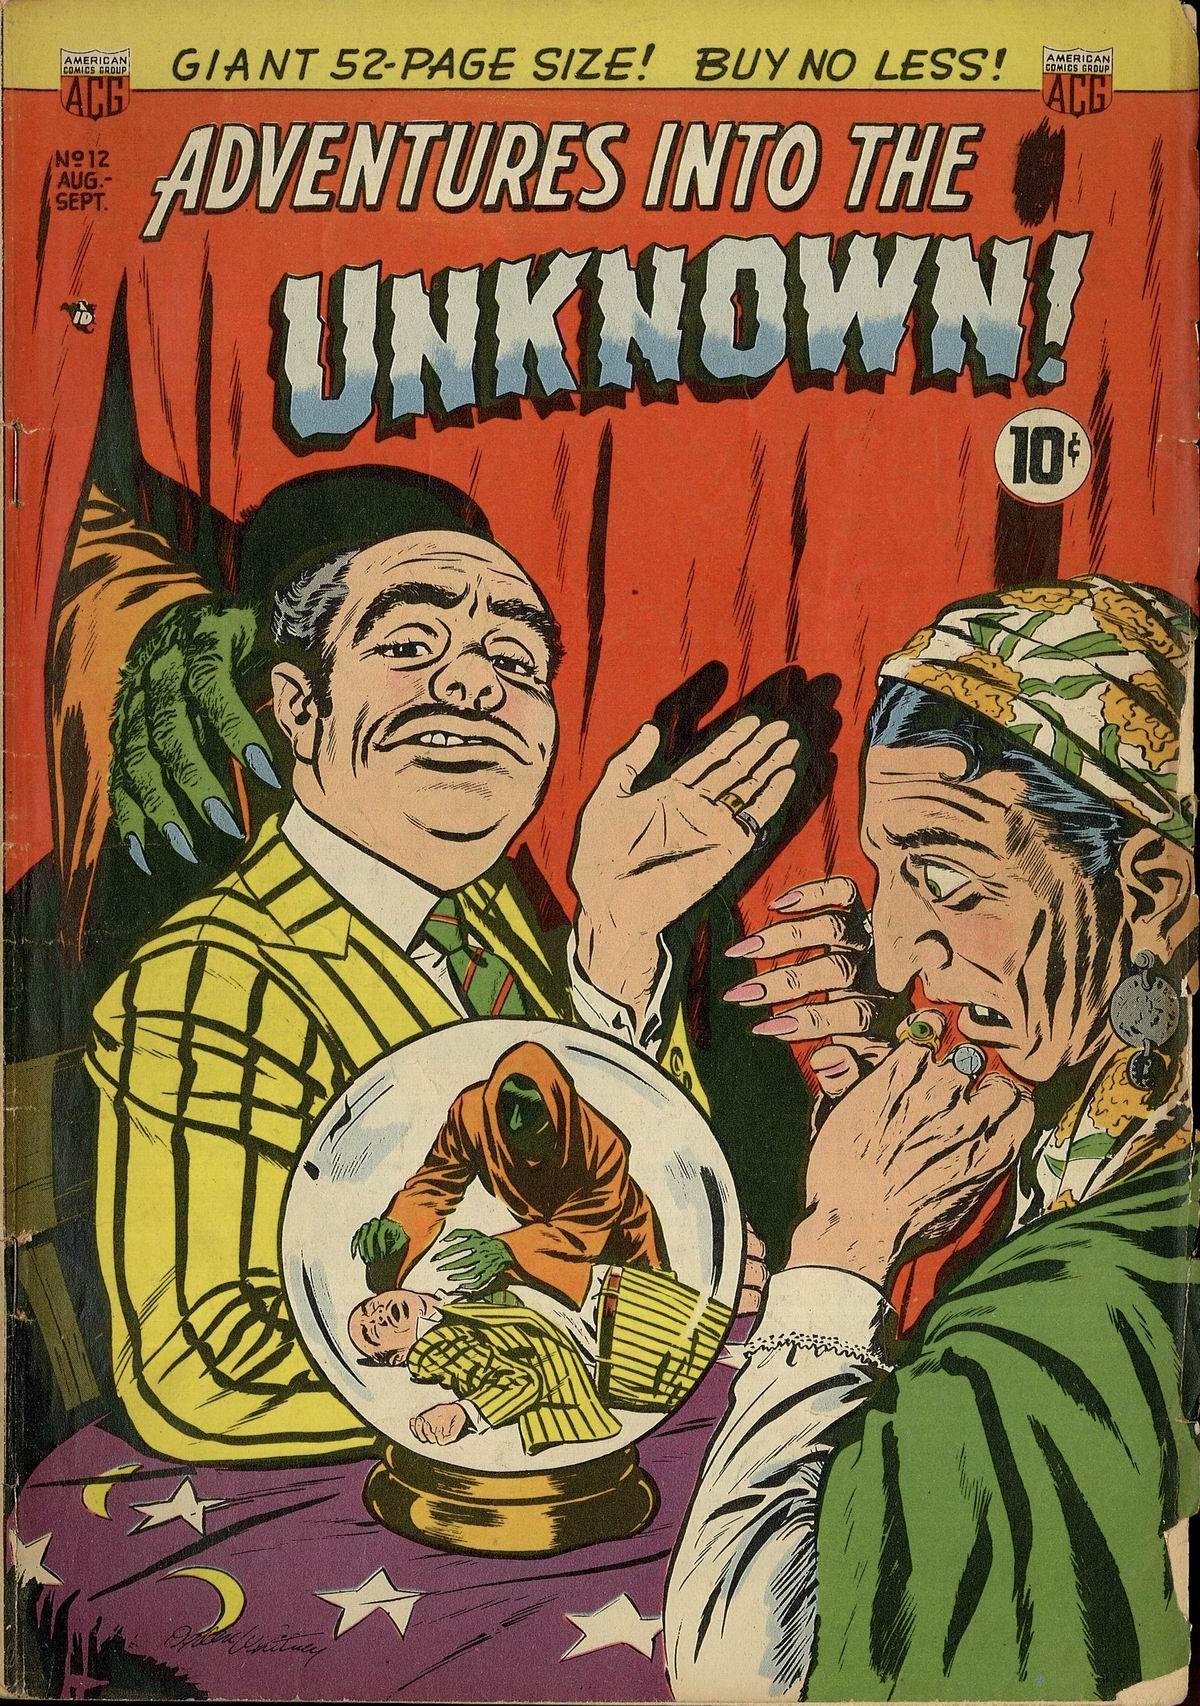 Adventures into the unknown 1950s comic lol comic books